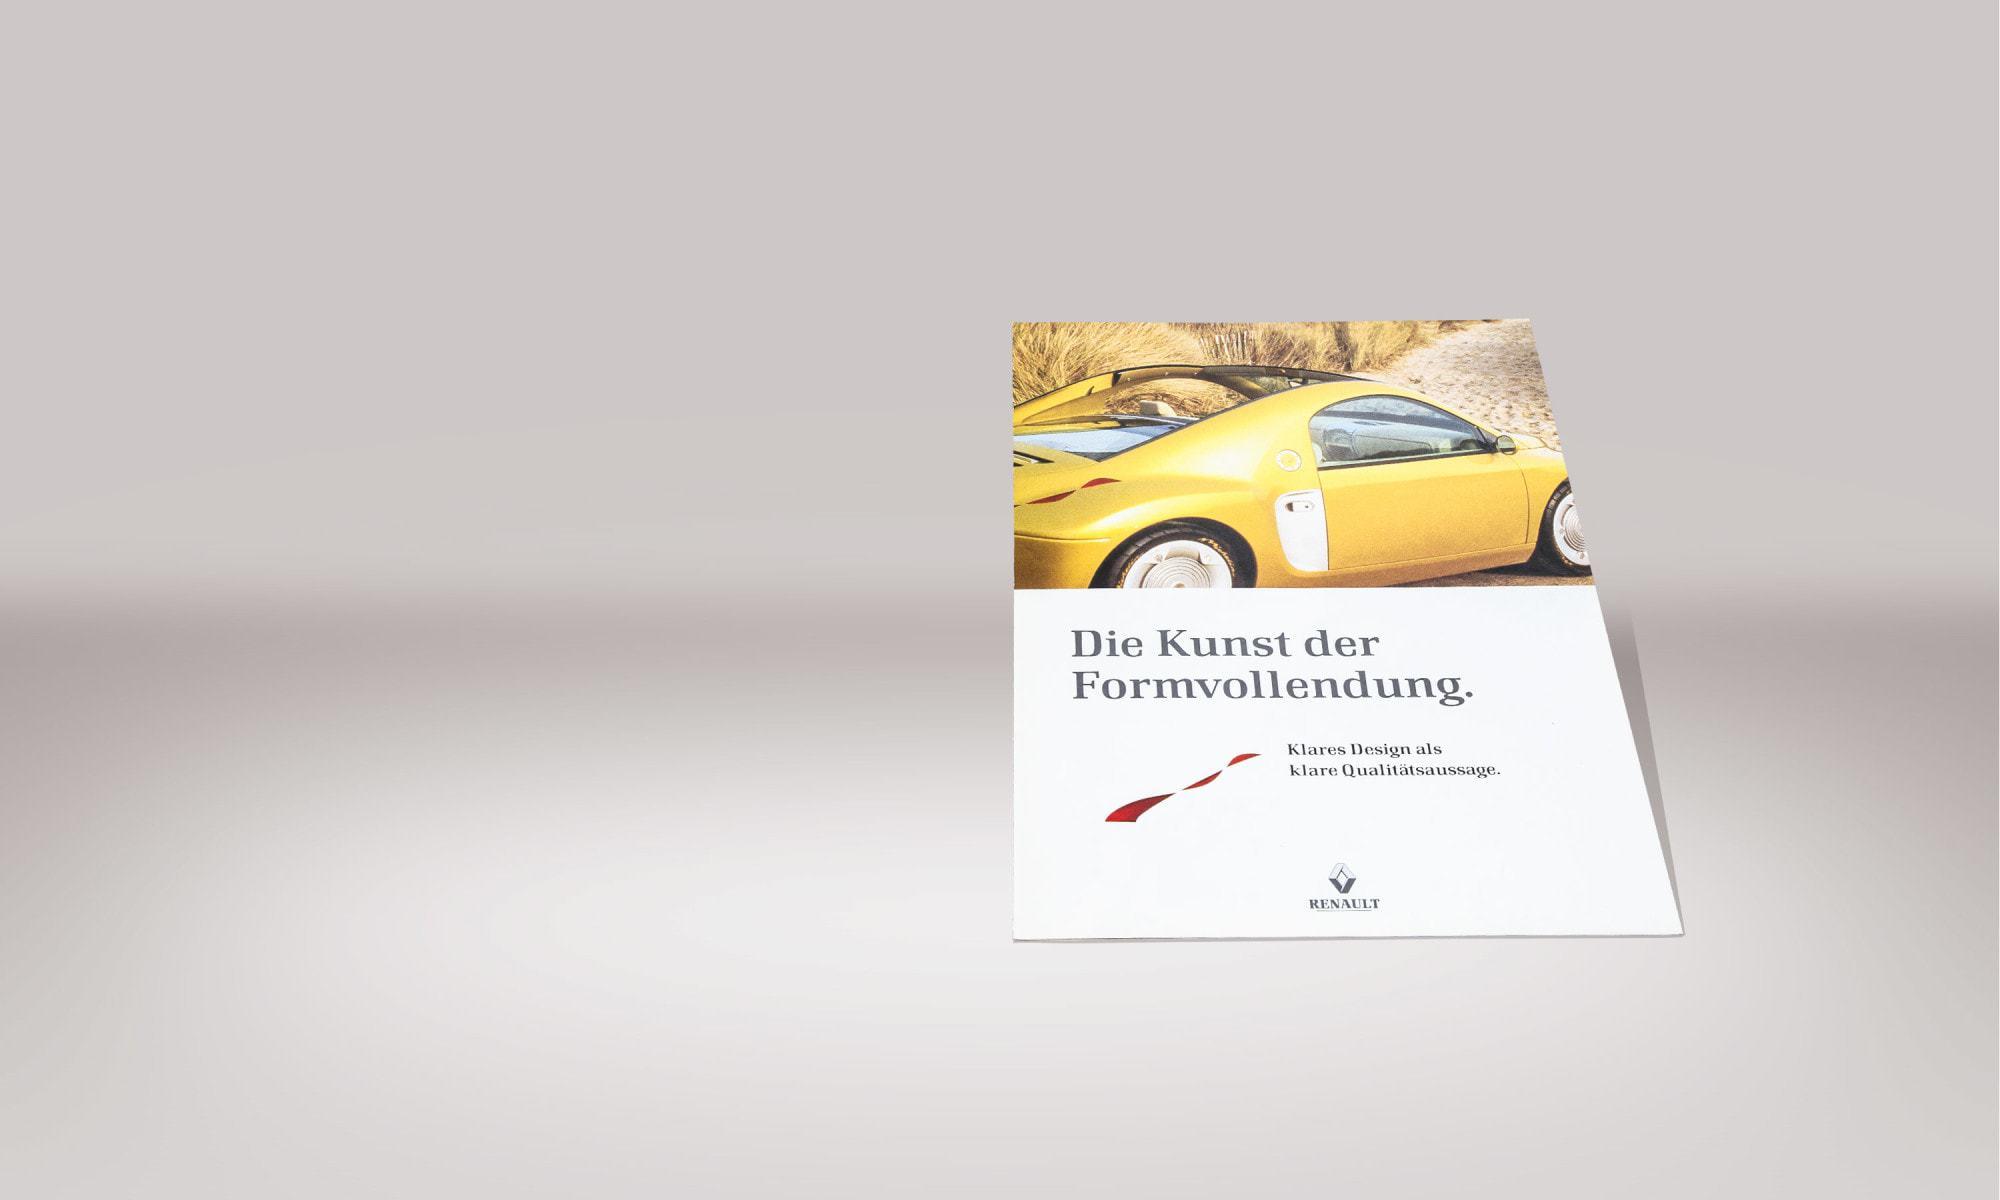 Renault Deutschland AG – Modelprospekt